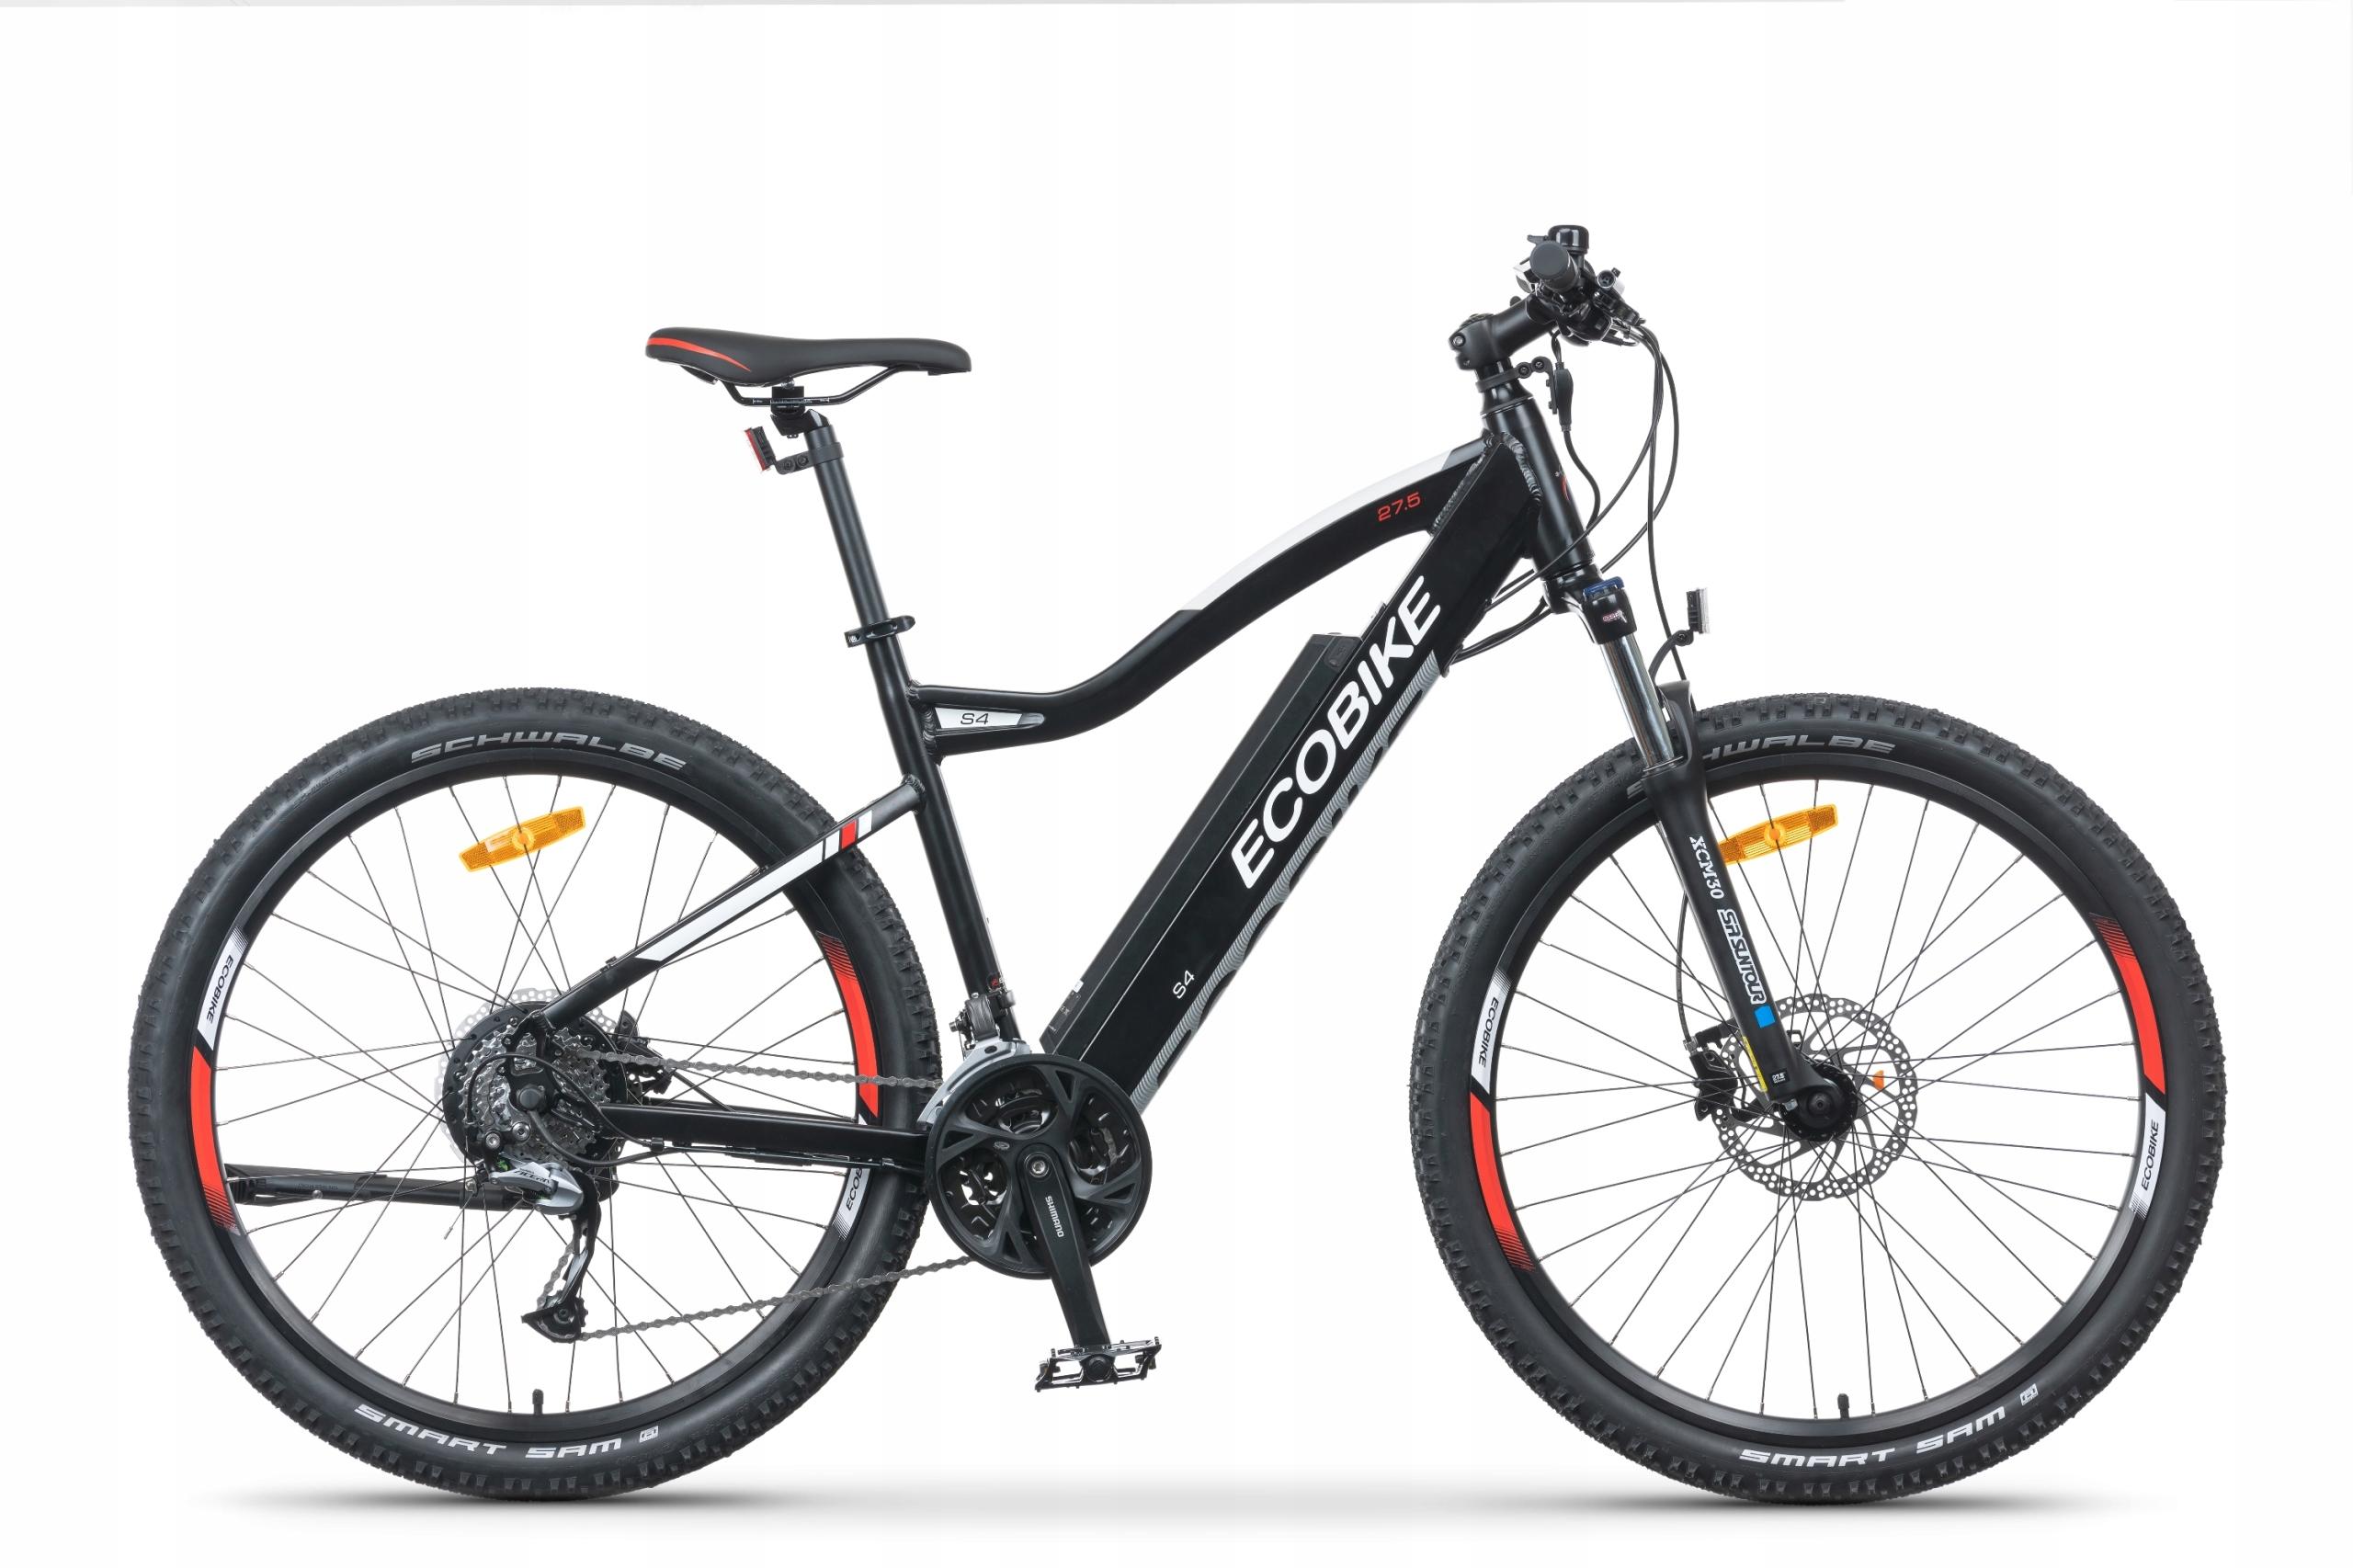 велосипед электрический ECOBIKE S4 для 35 kmh 540W 10,4Ah